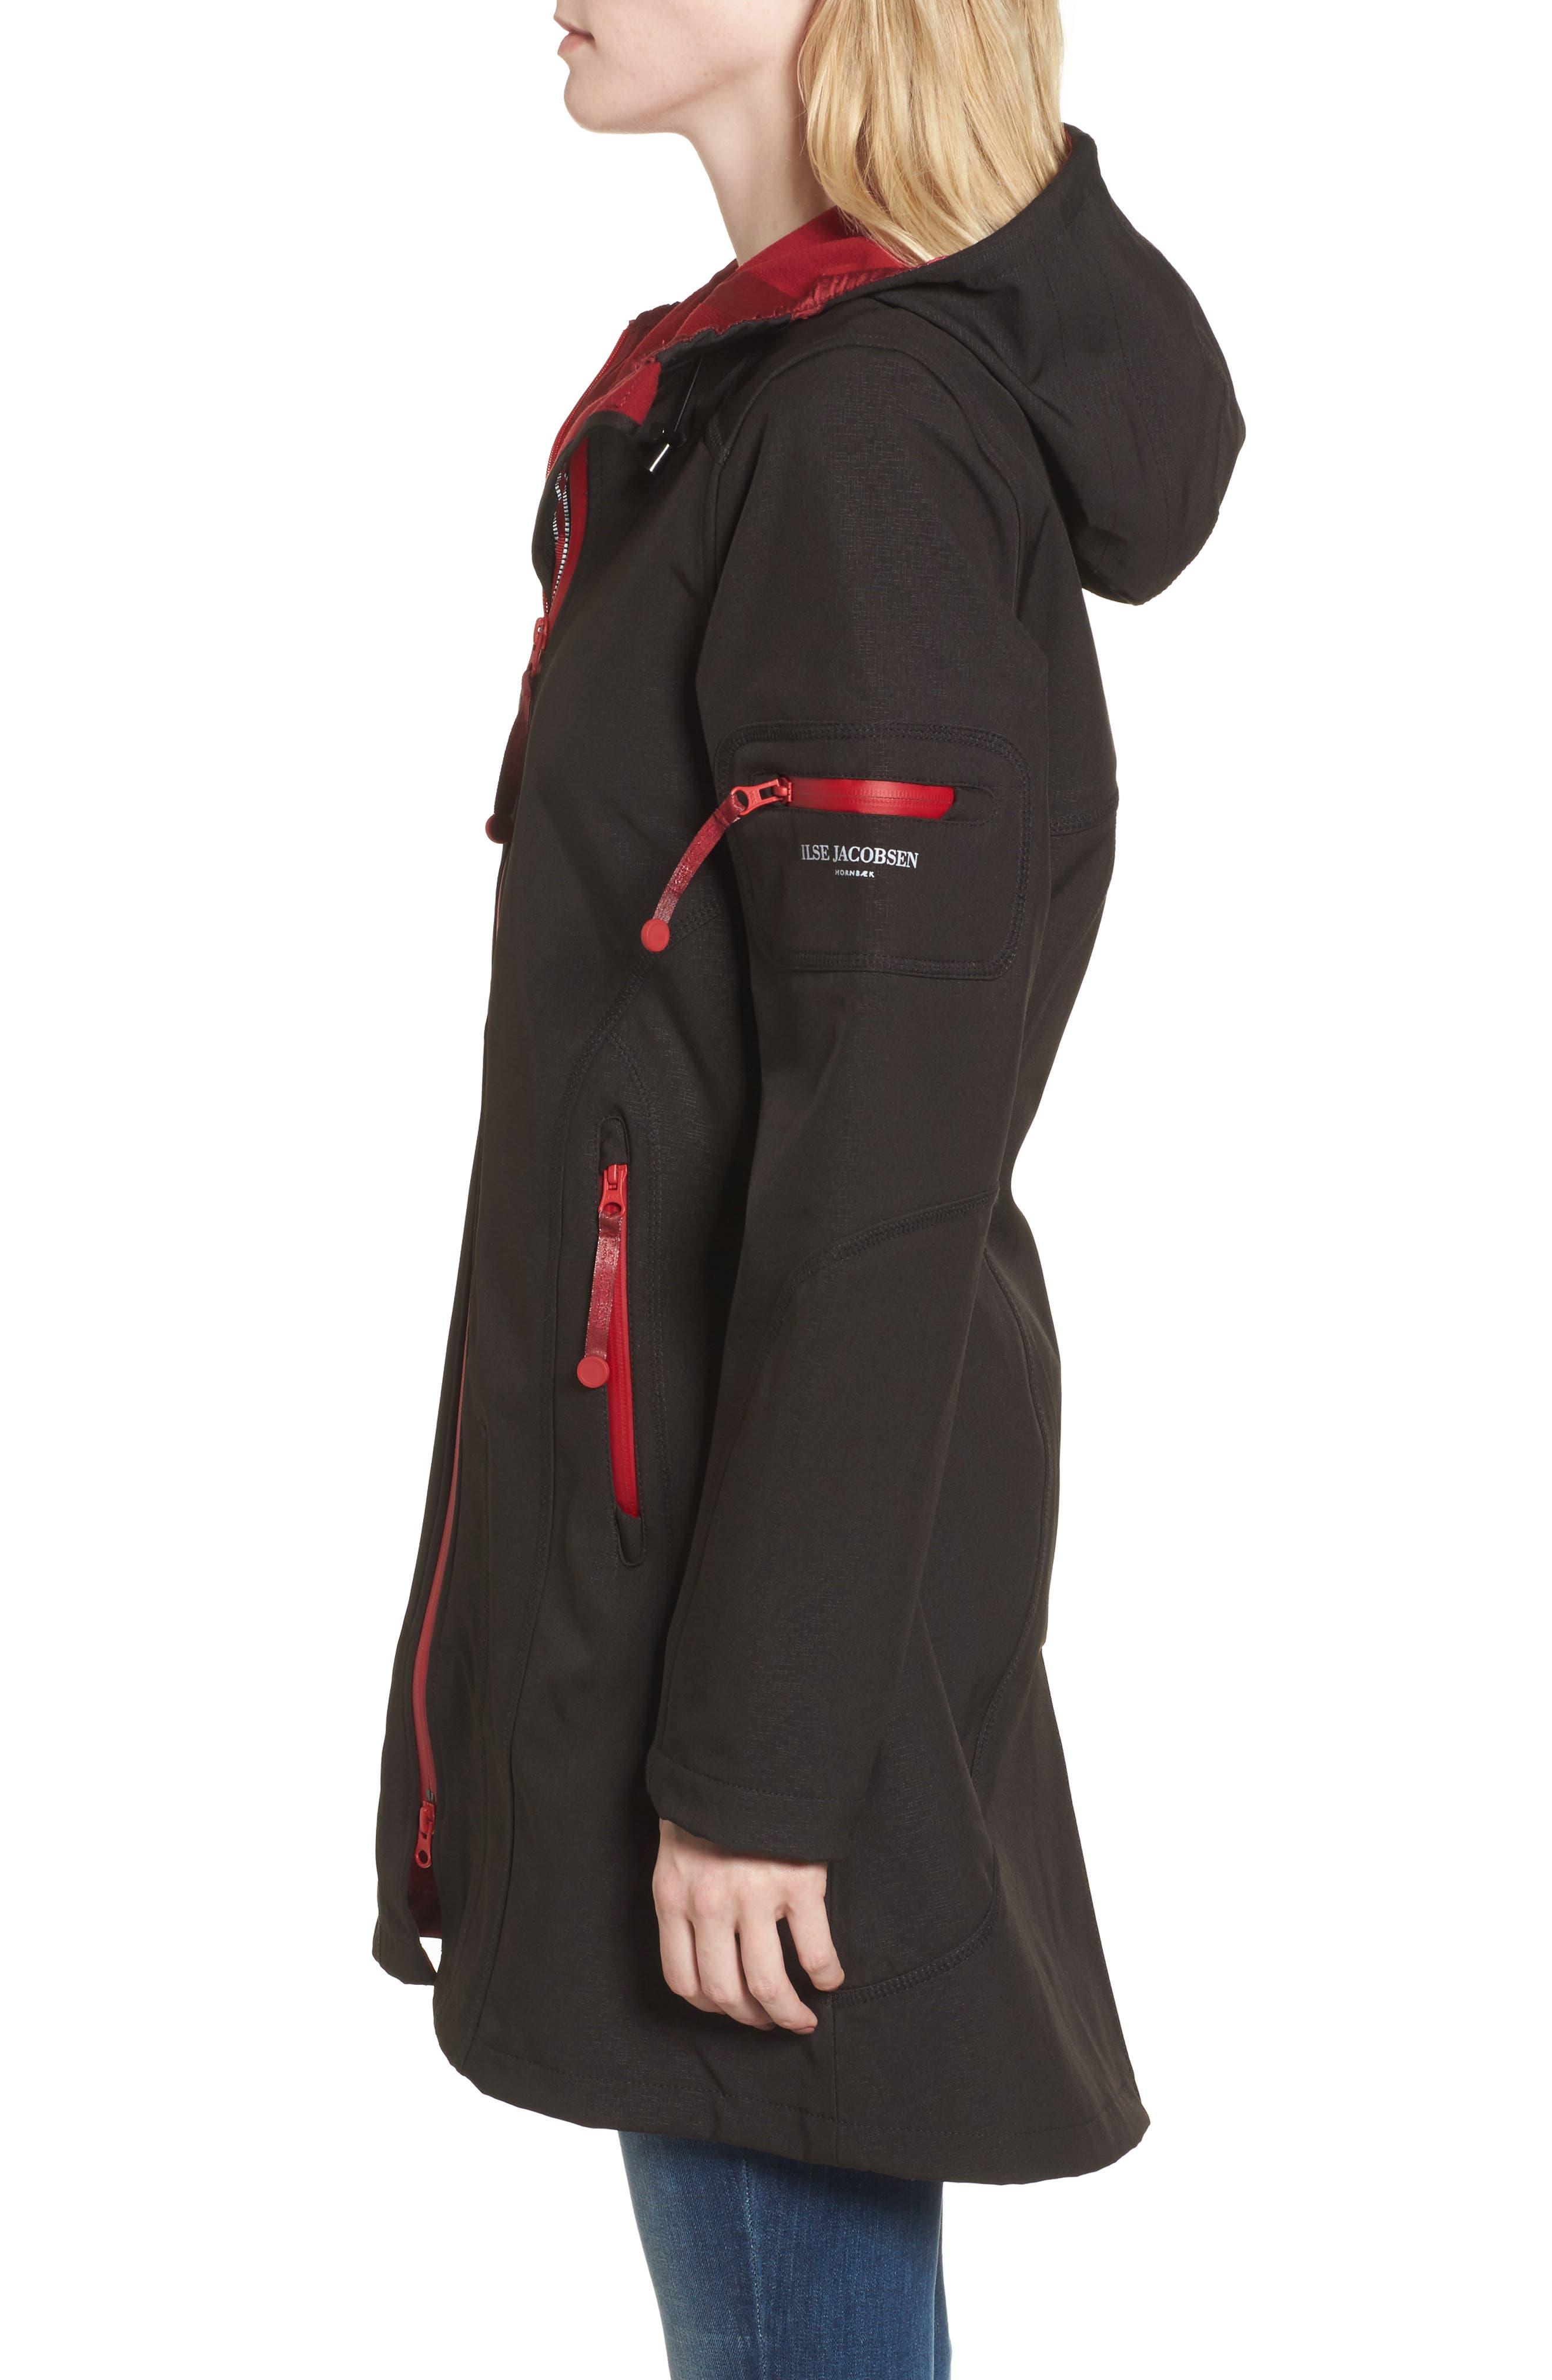 'Rain 7B' Hooded Water Resistant Coat,                             Alternate thumbnail 4, color,                             Black/ Wine